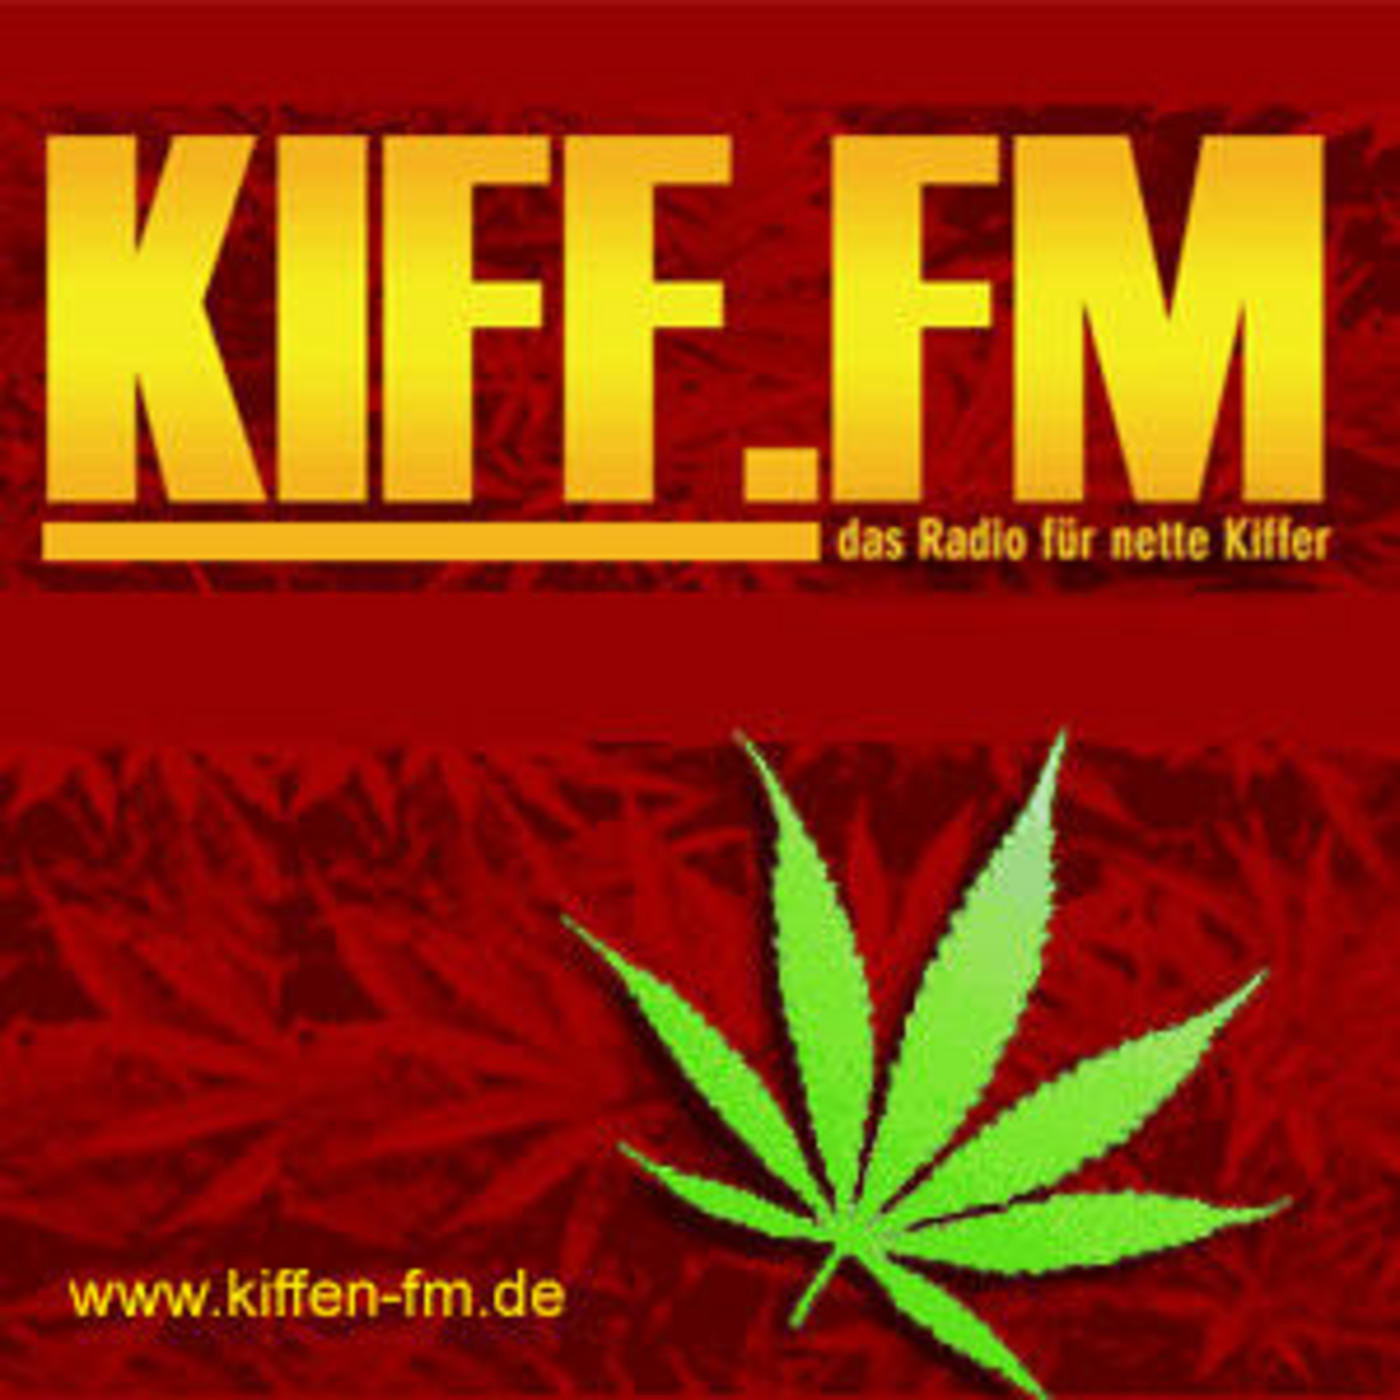 Folge 13 hartz minus 10 en kiff fm en mp3 06 06 a las 09 for Chambre 13 kiff no beat mp3